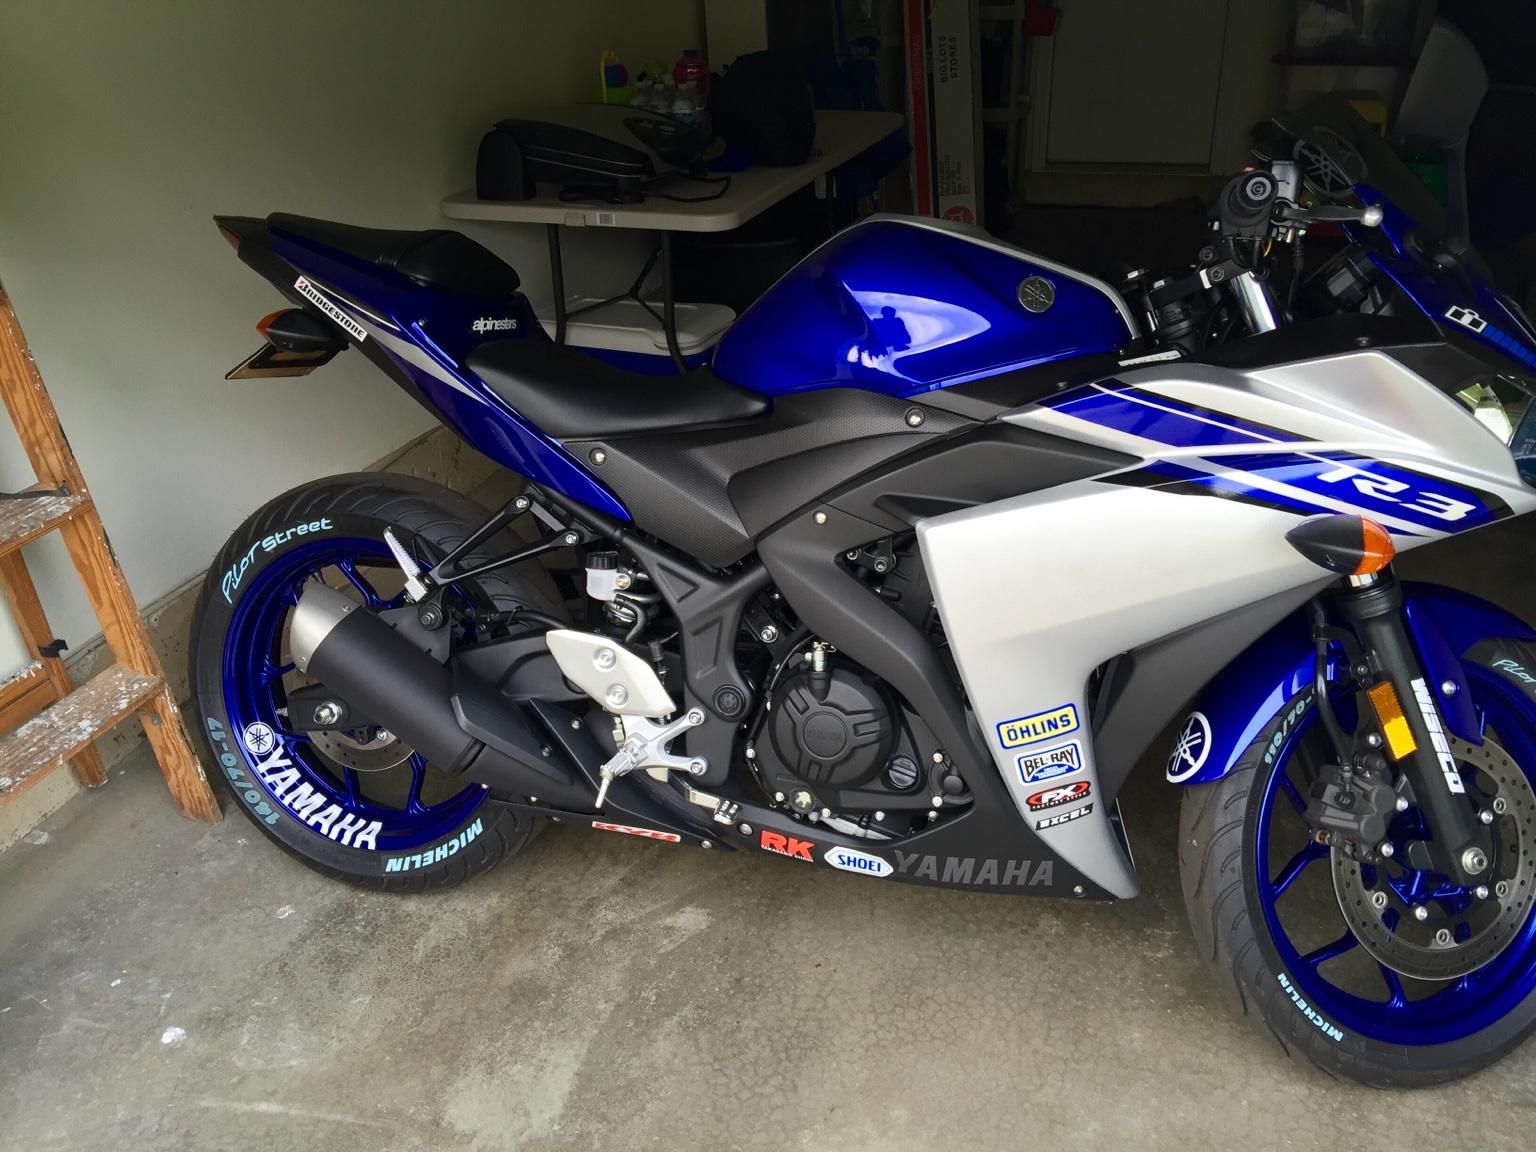 Yamaha rim decal